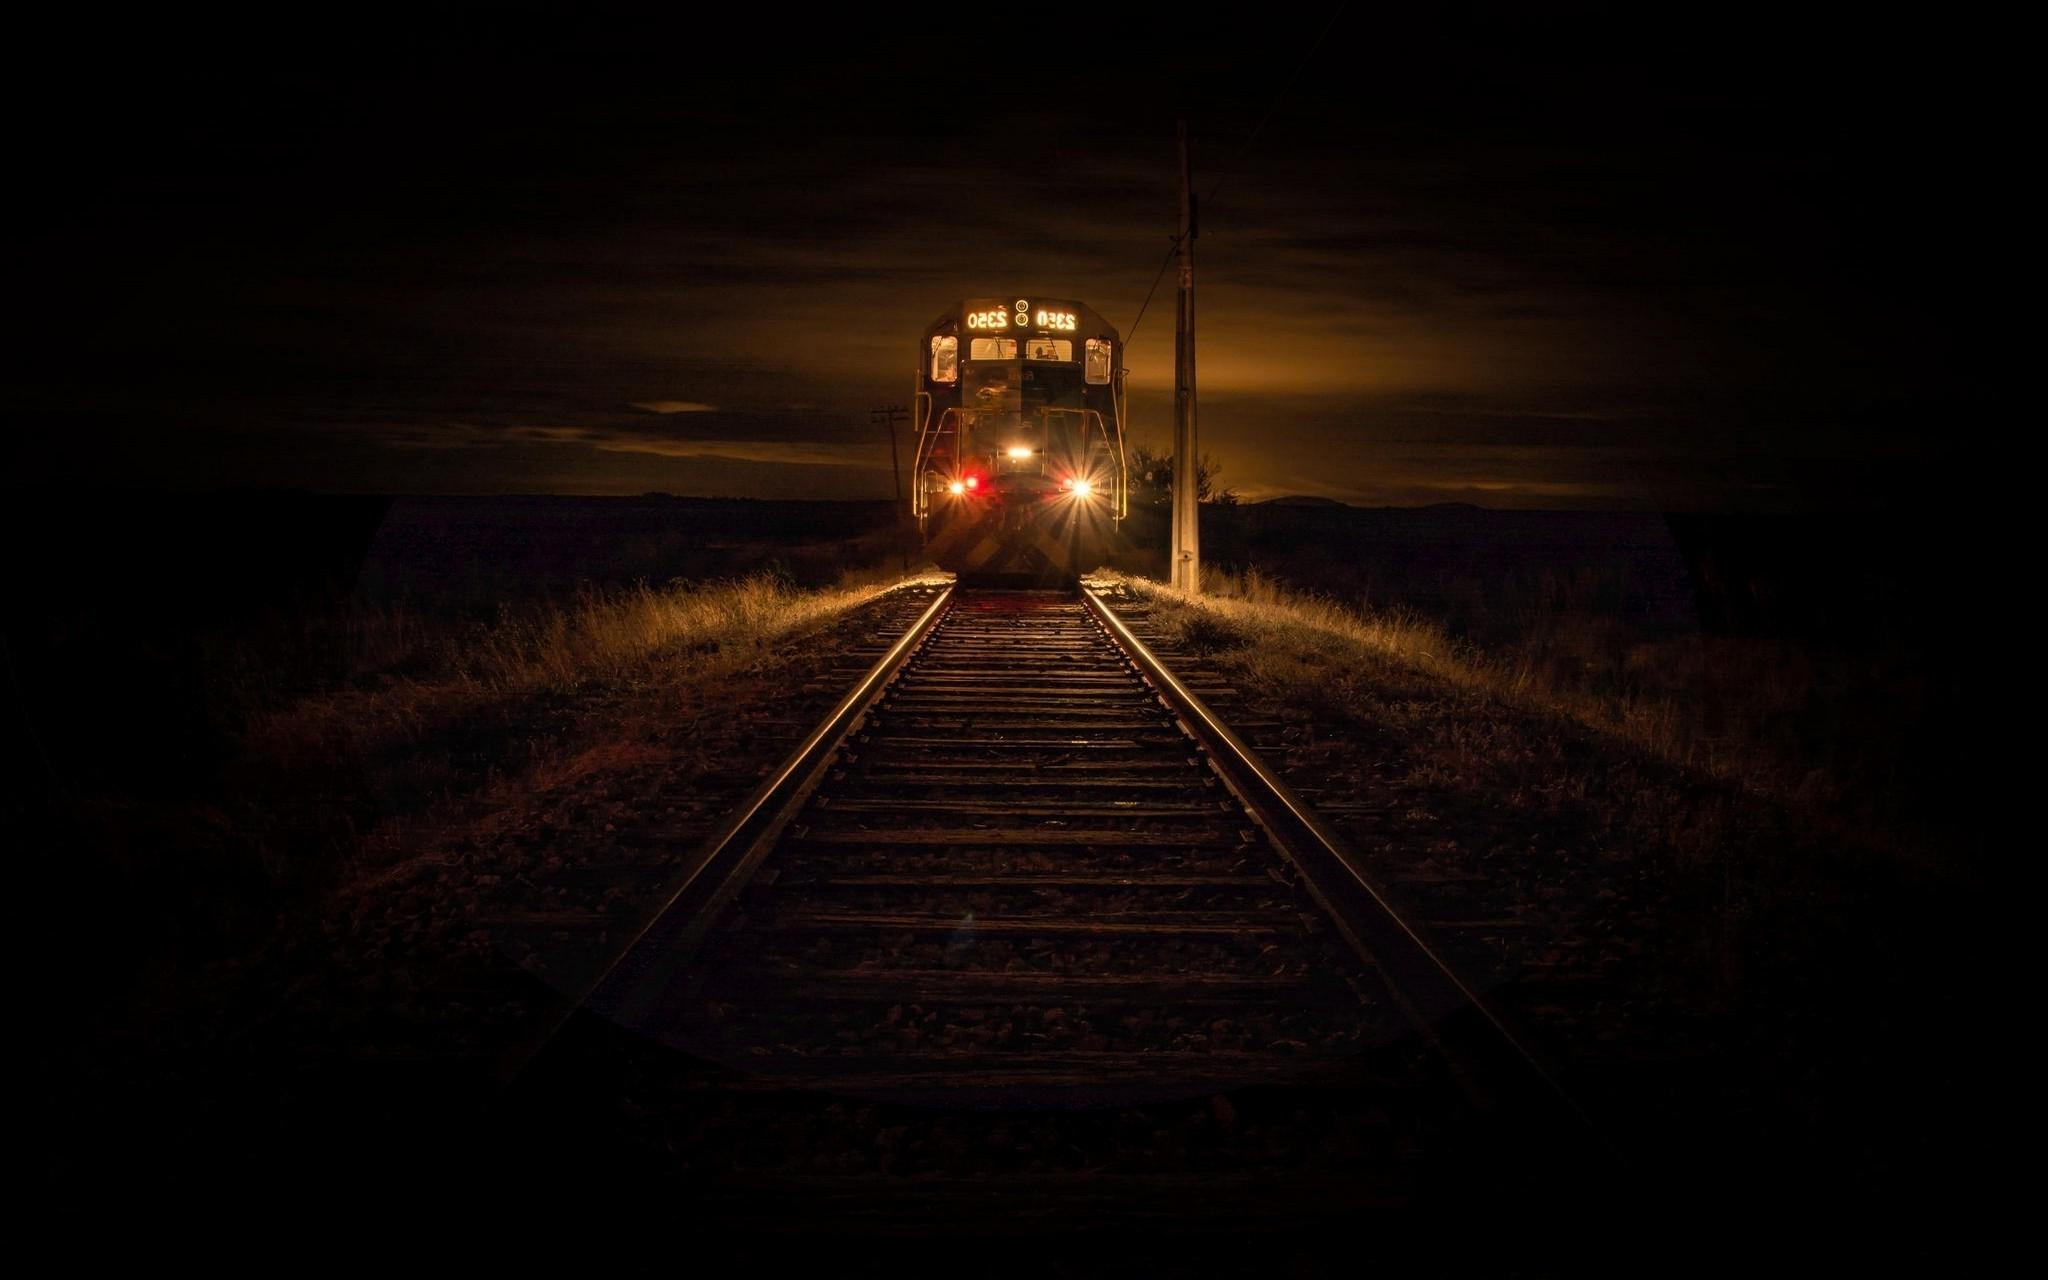 картинки темный фон лес железная дорога попробуйте